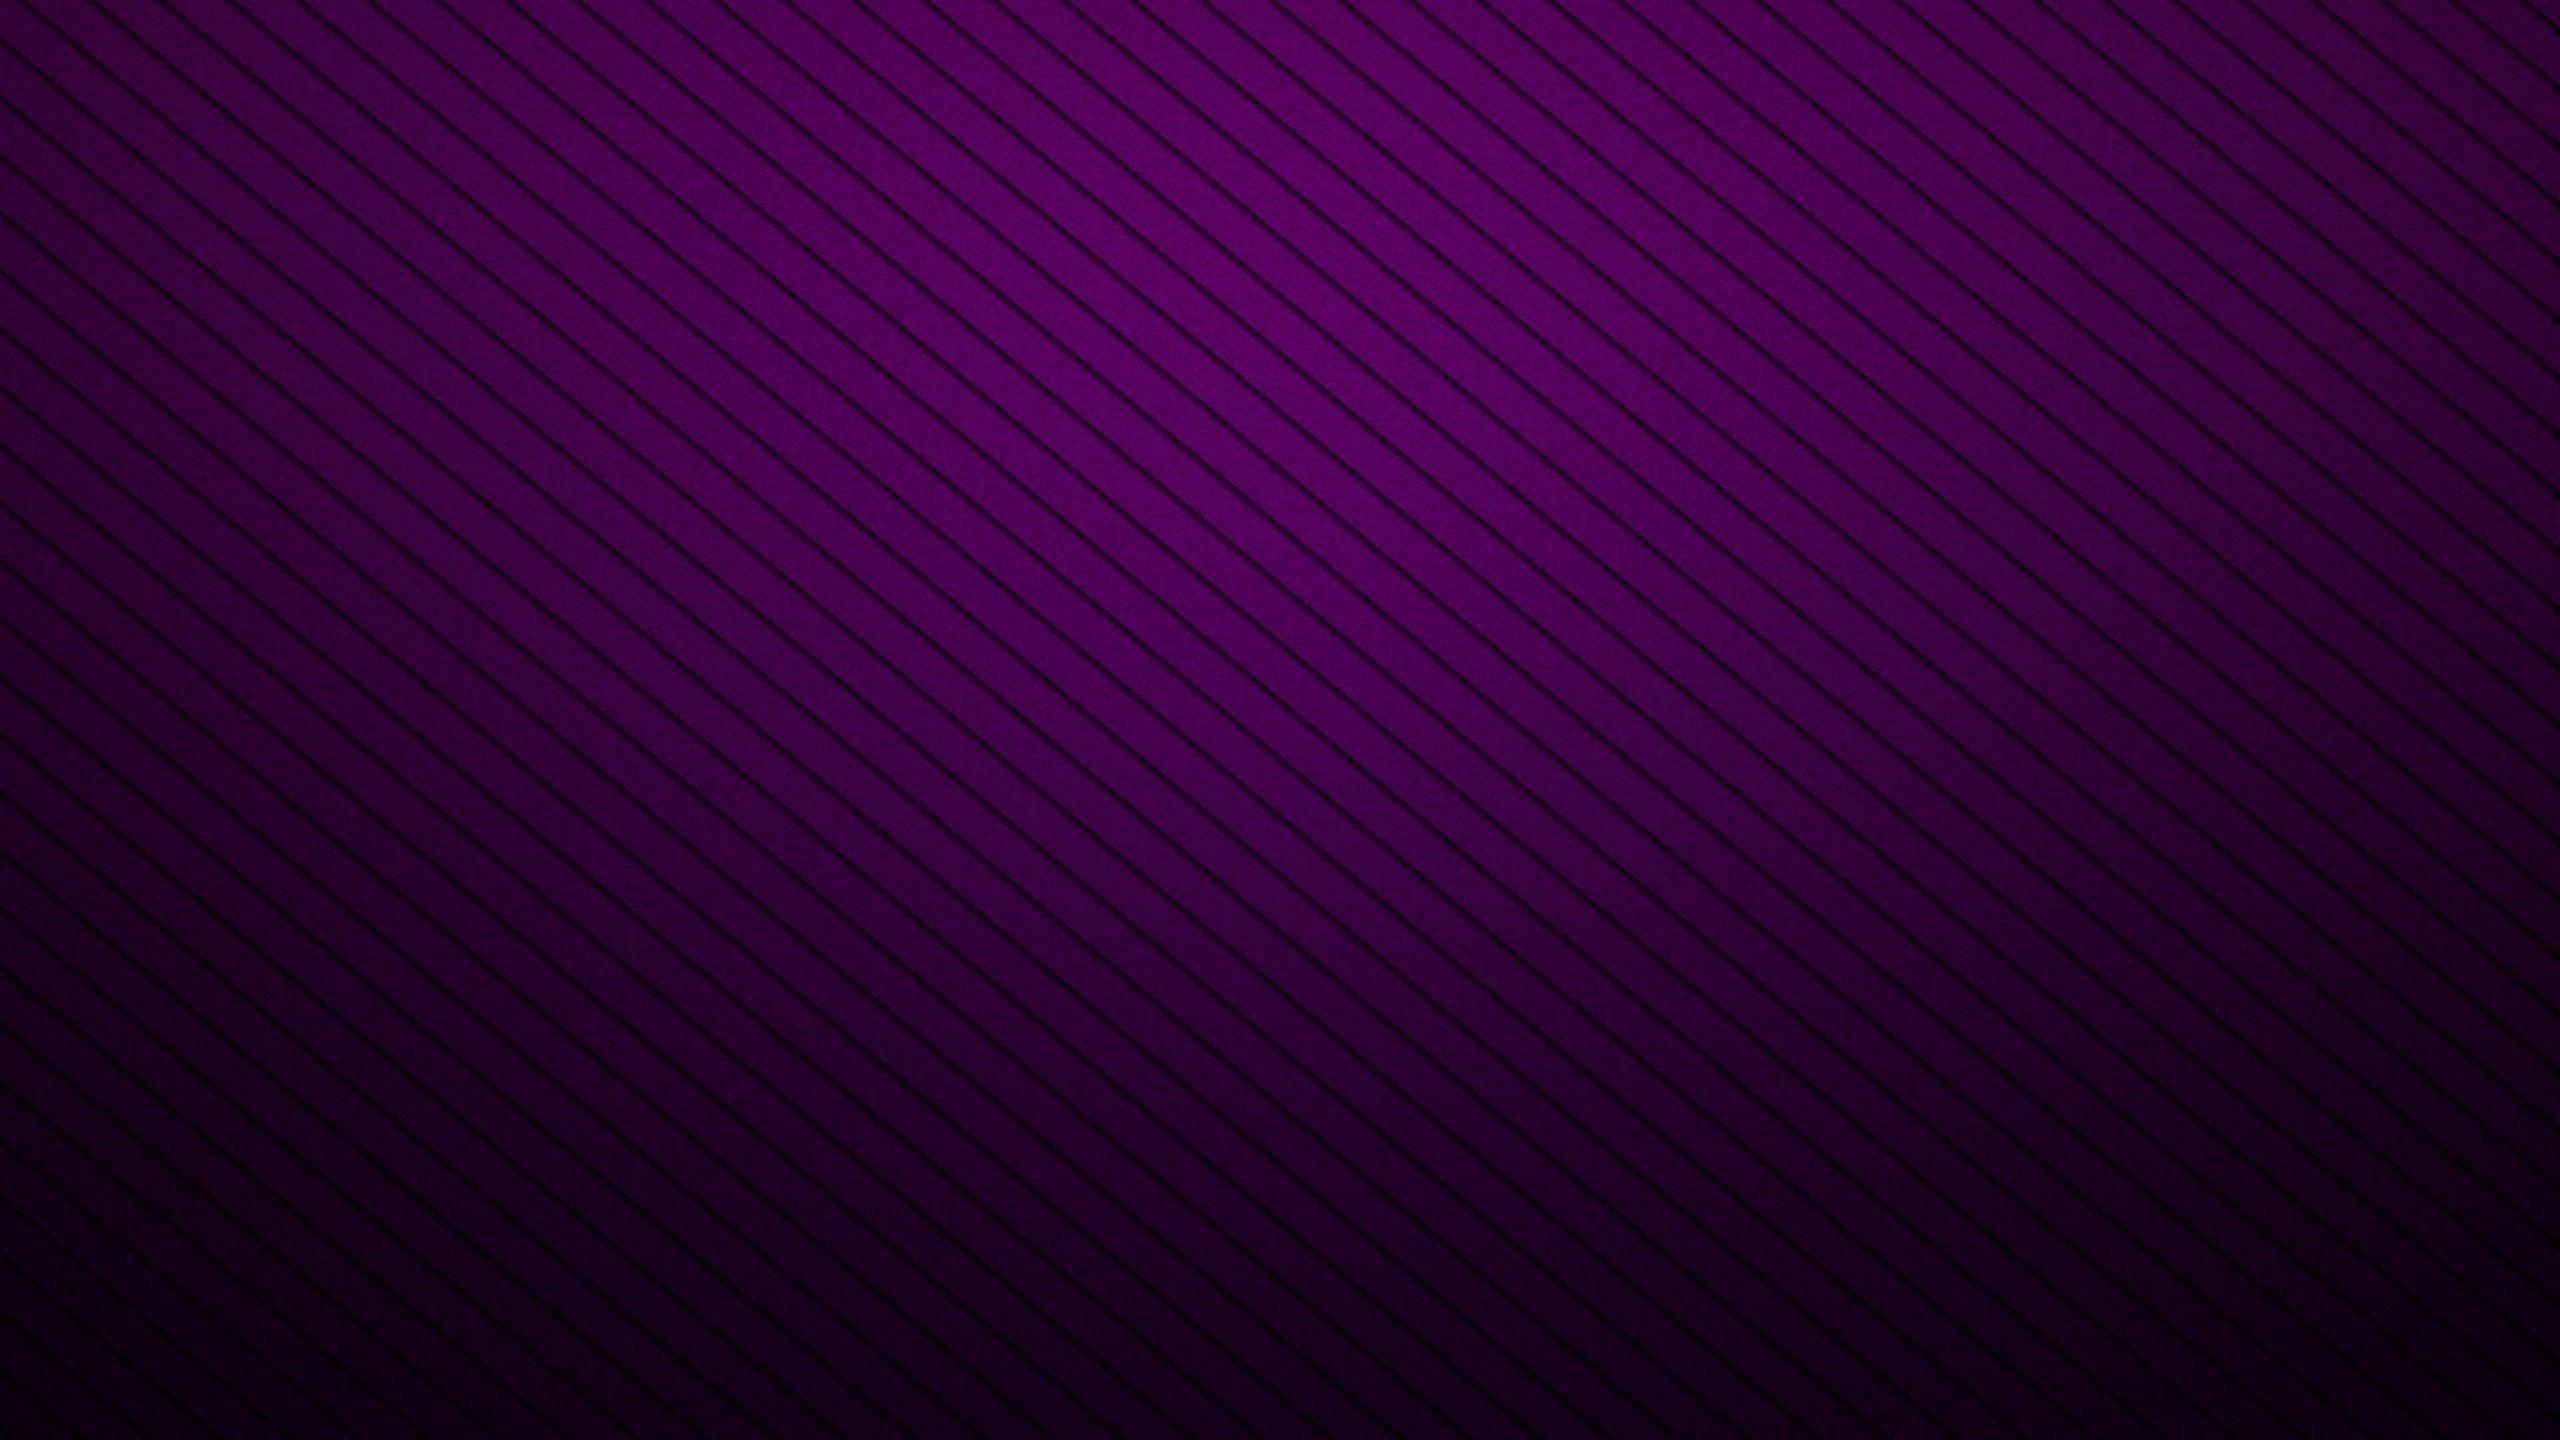 2560x1440 Simple Purple Wallpapers High Definition Simple Windows Desktop Backgrounds 2560x1440 Wallpaper Teahub Io